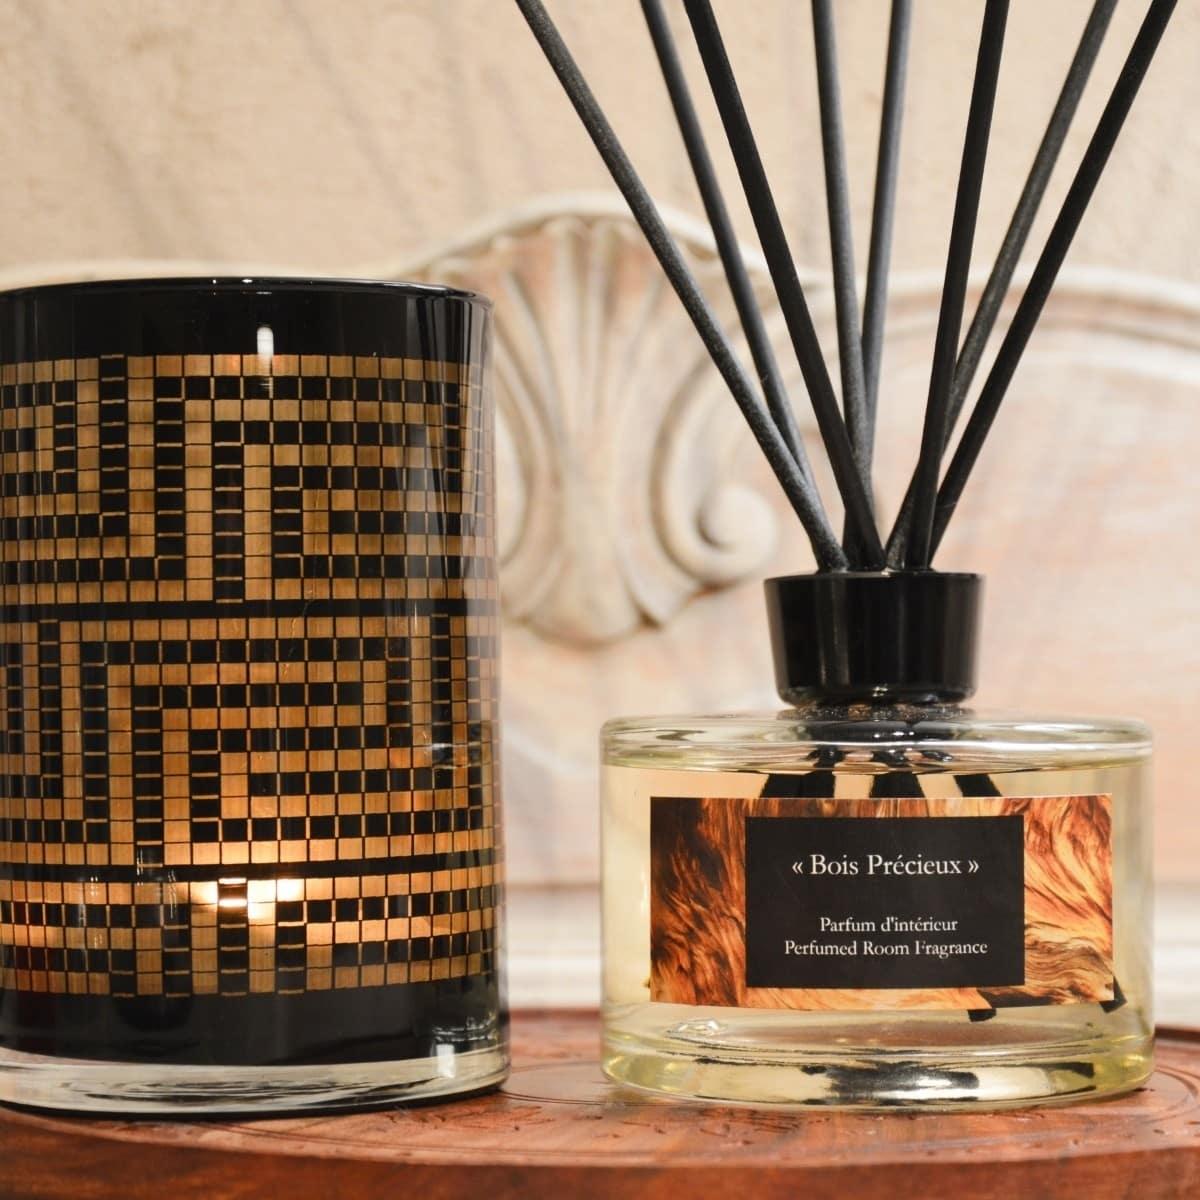 Luxury perfume reed diffuser